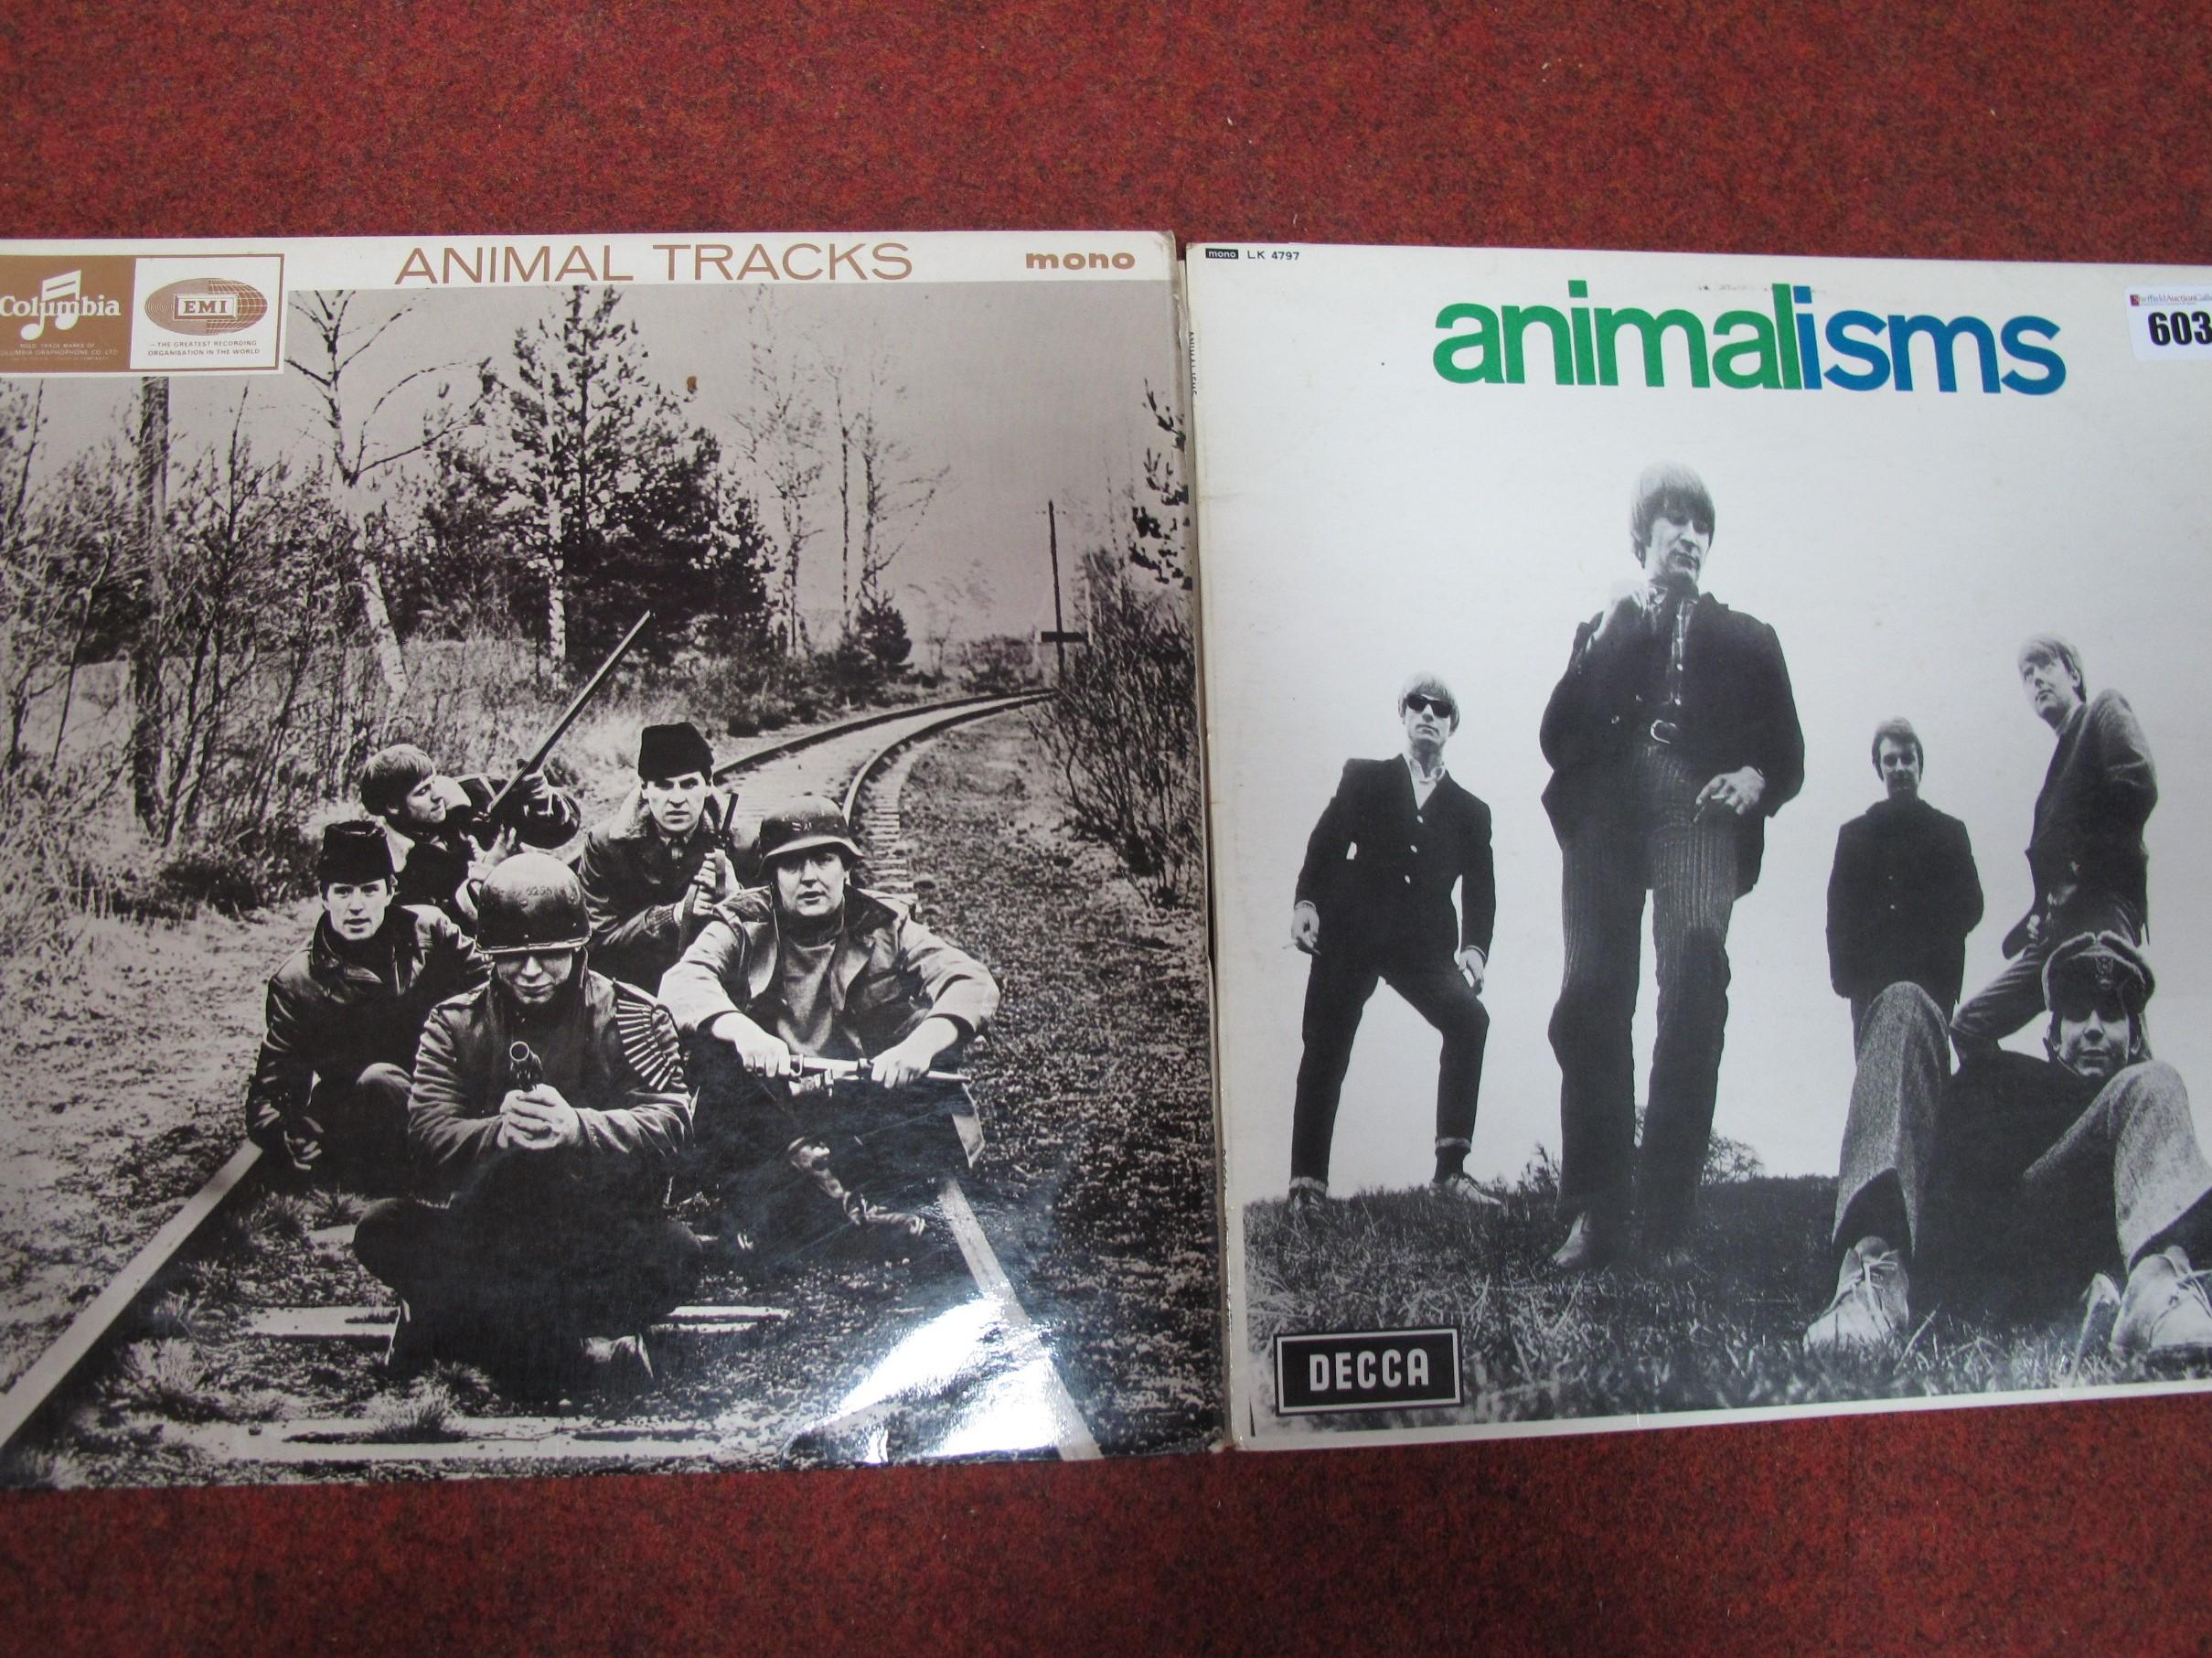 Lot 603 - The Animals: 'Animal Tracks' LP, 1965, blue/black Columbia, Mono 33SX 1708, -1/-1 matrix,